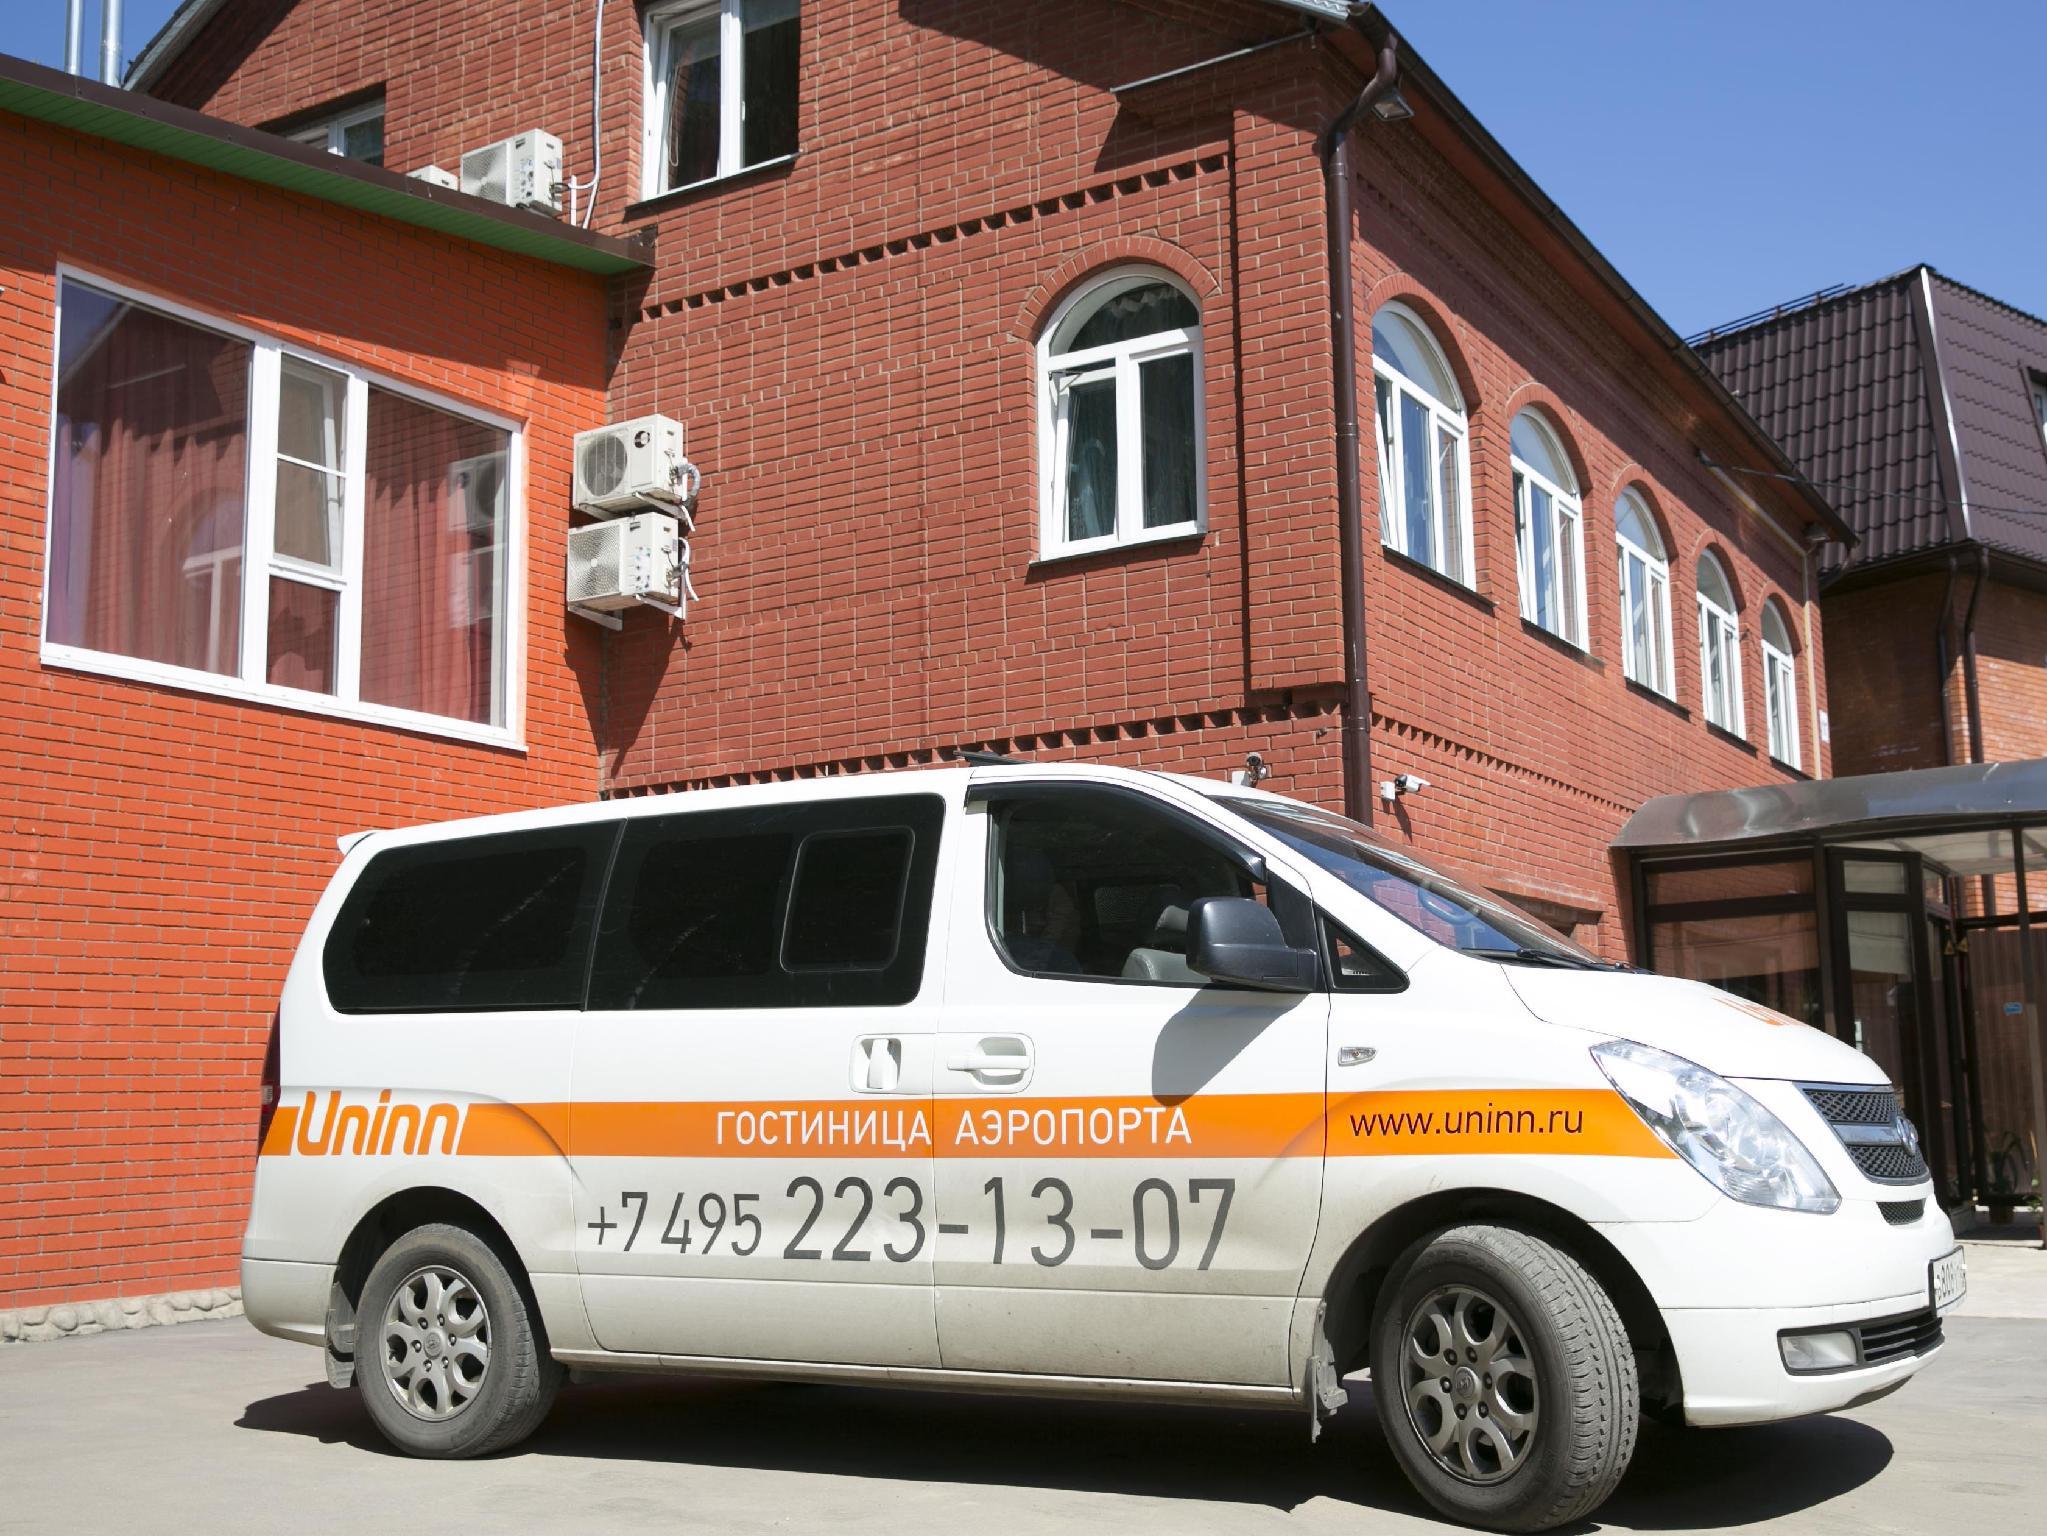 Uninn Hotel Vnukovo